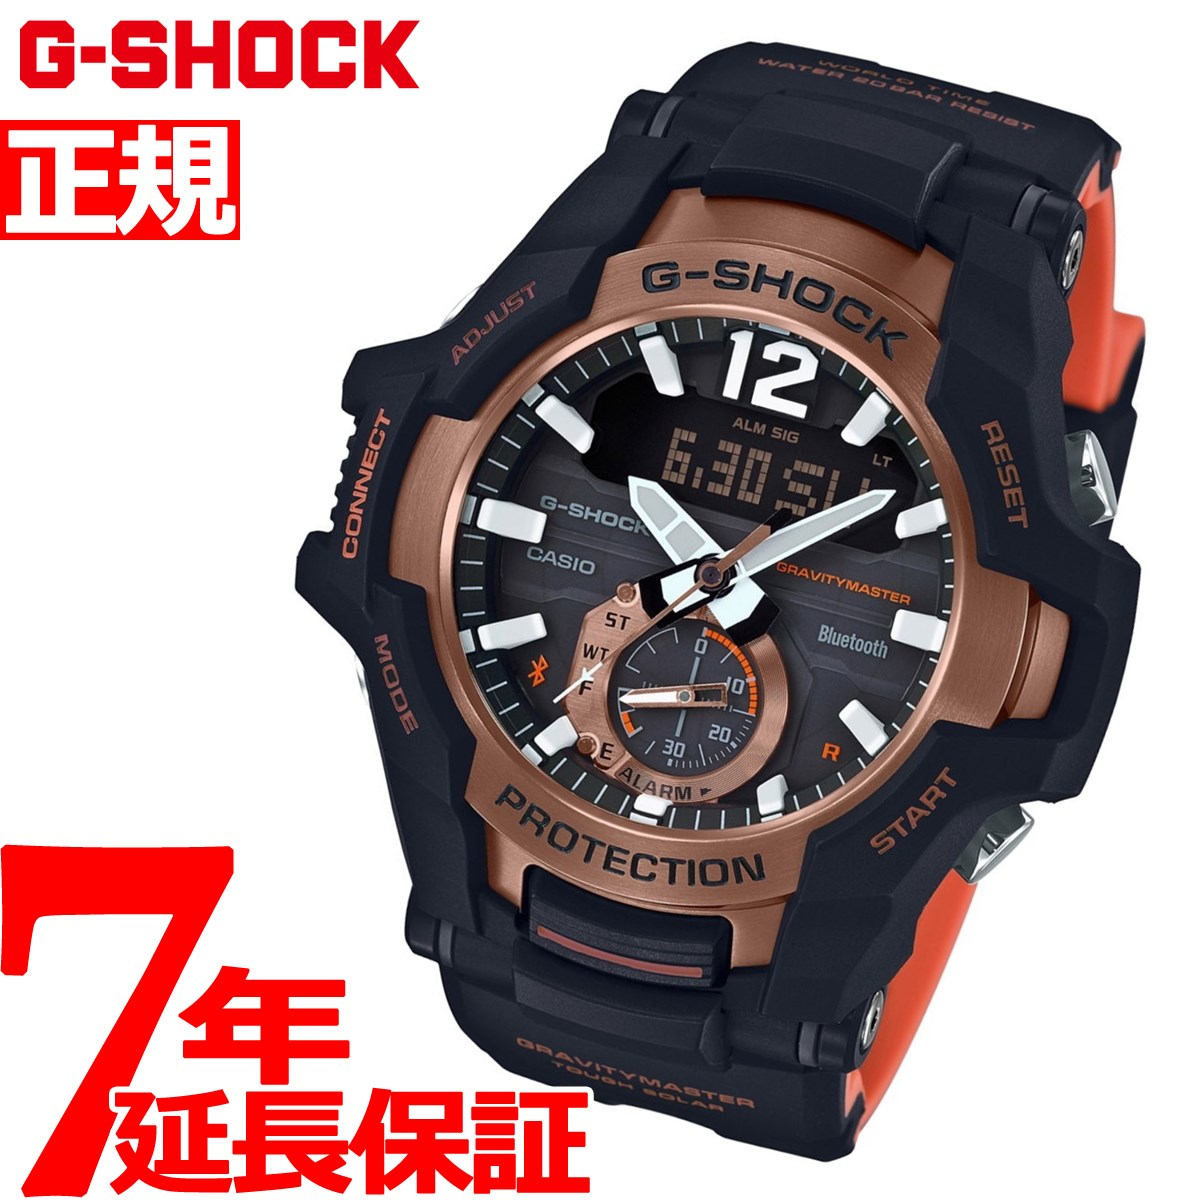 G-SHOCK カシオ Gショック グラビティマスター CASIO 腕時計 メンズ MASTER OF G GR-B100-1A4JF【2018 新作】